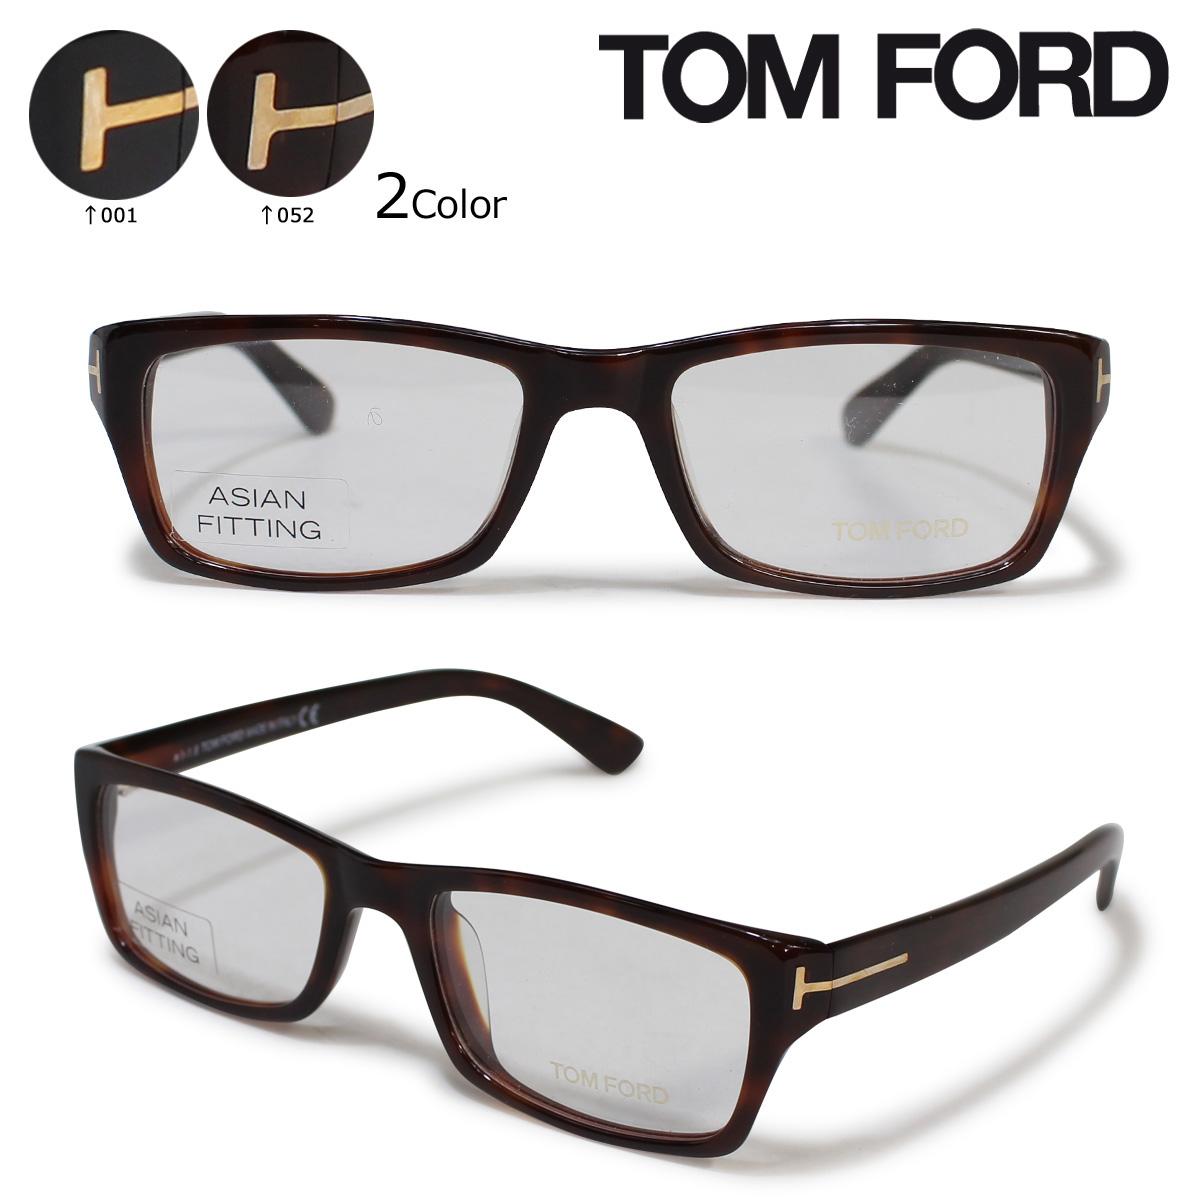 TOM FORD トムフォード メガネ 眼鏡 メンズ レディース アイウェア ASIAN FITTING FT4239 イタリア製